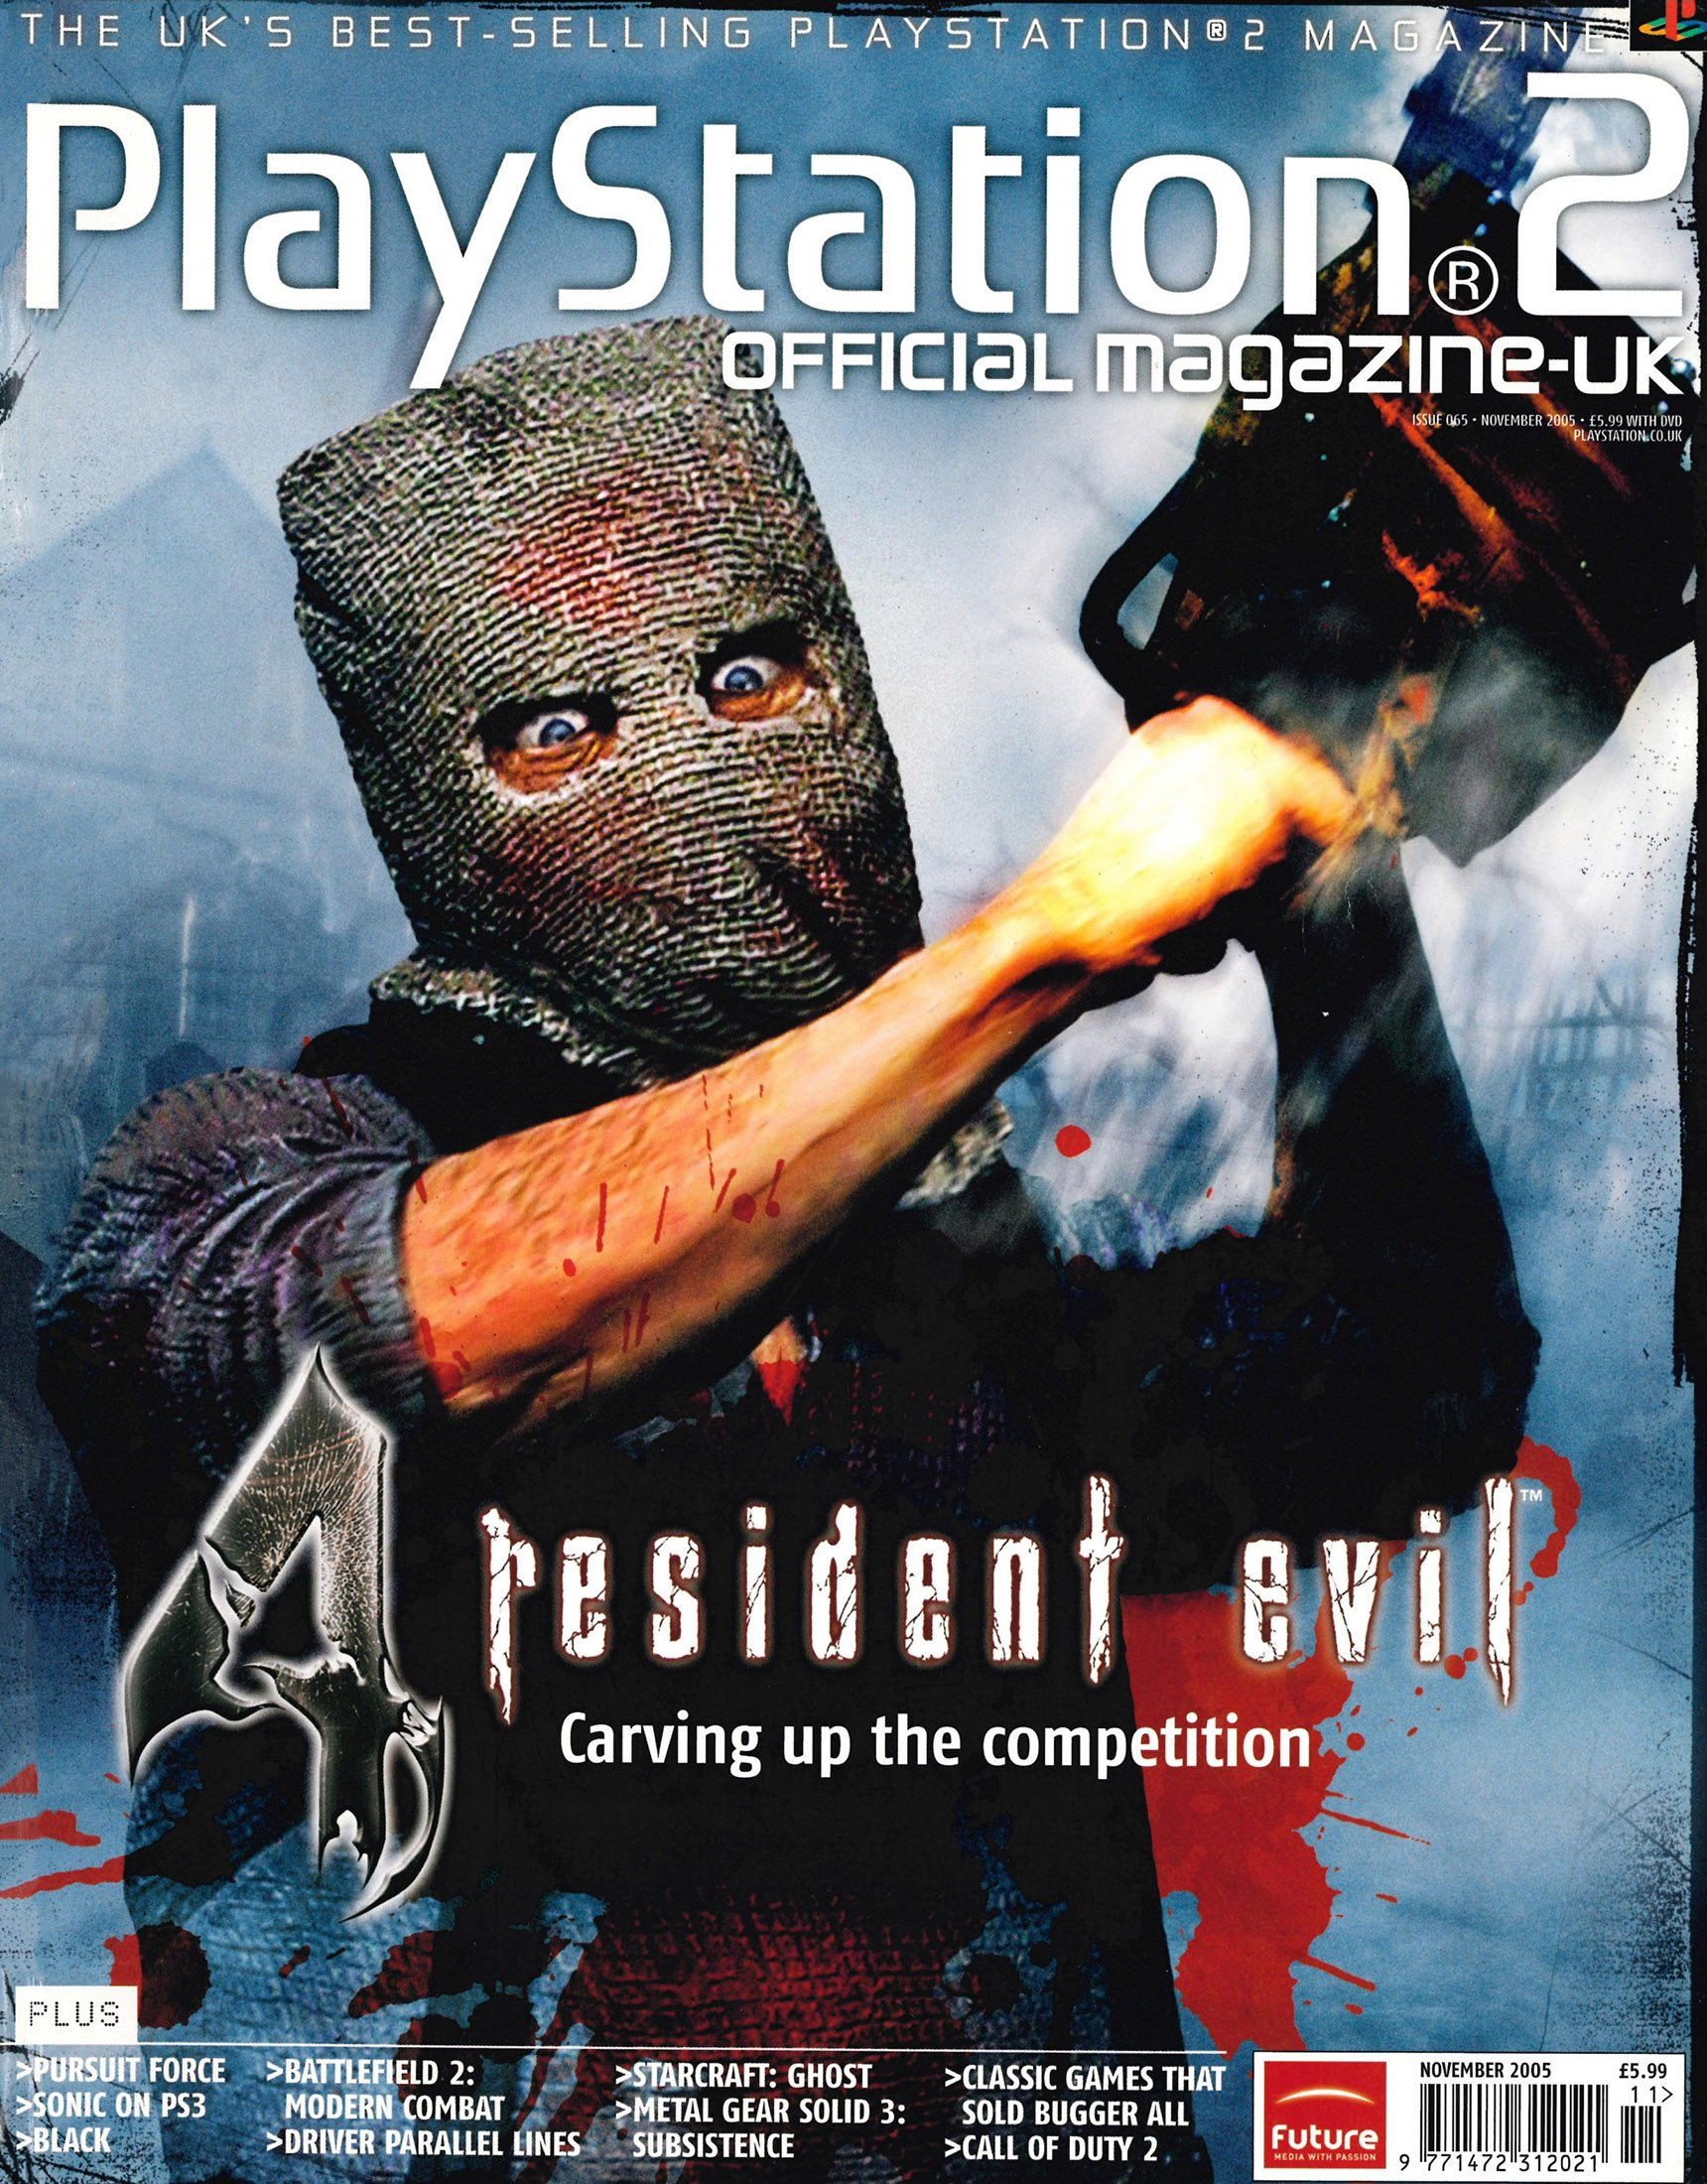 Official Playstation 2 Magazine UK 065 (November 2005)